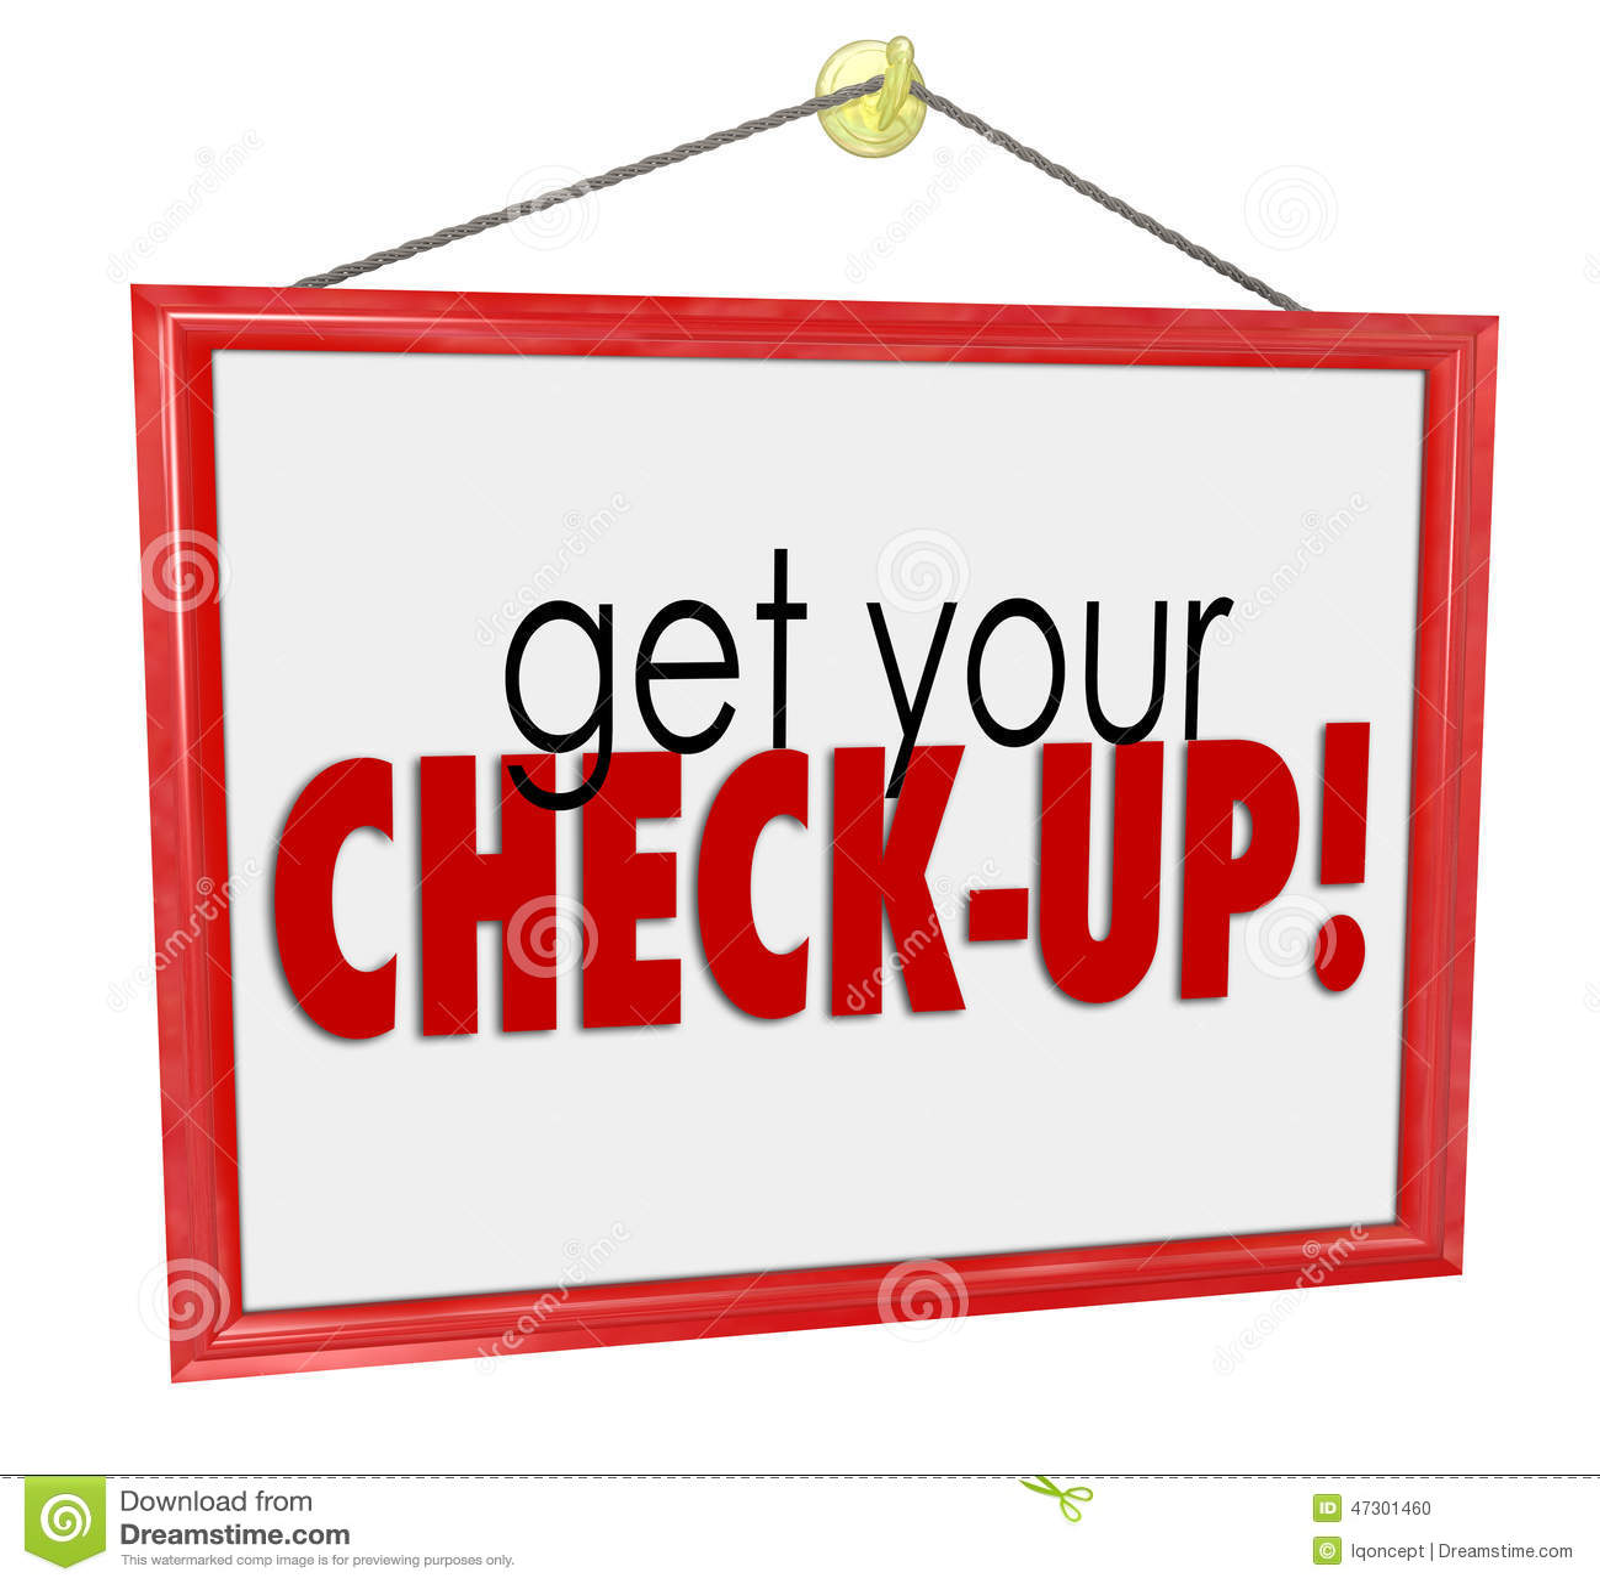 Free Grammar Checker Online for Everyone